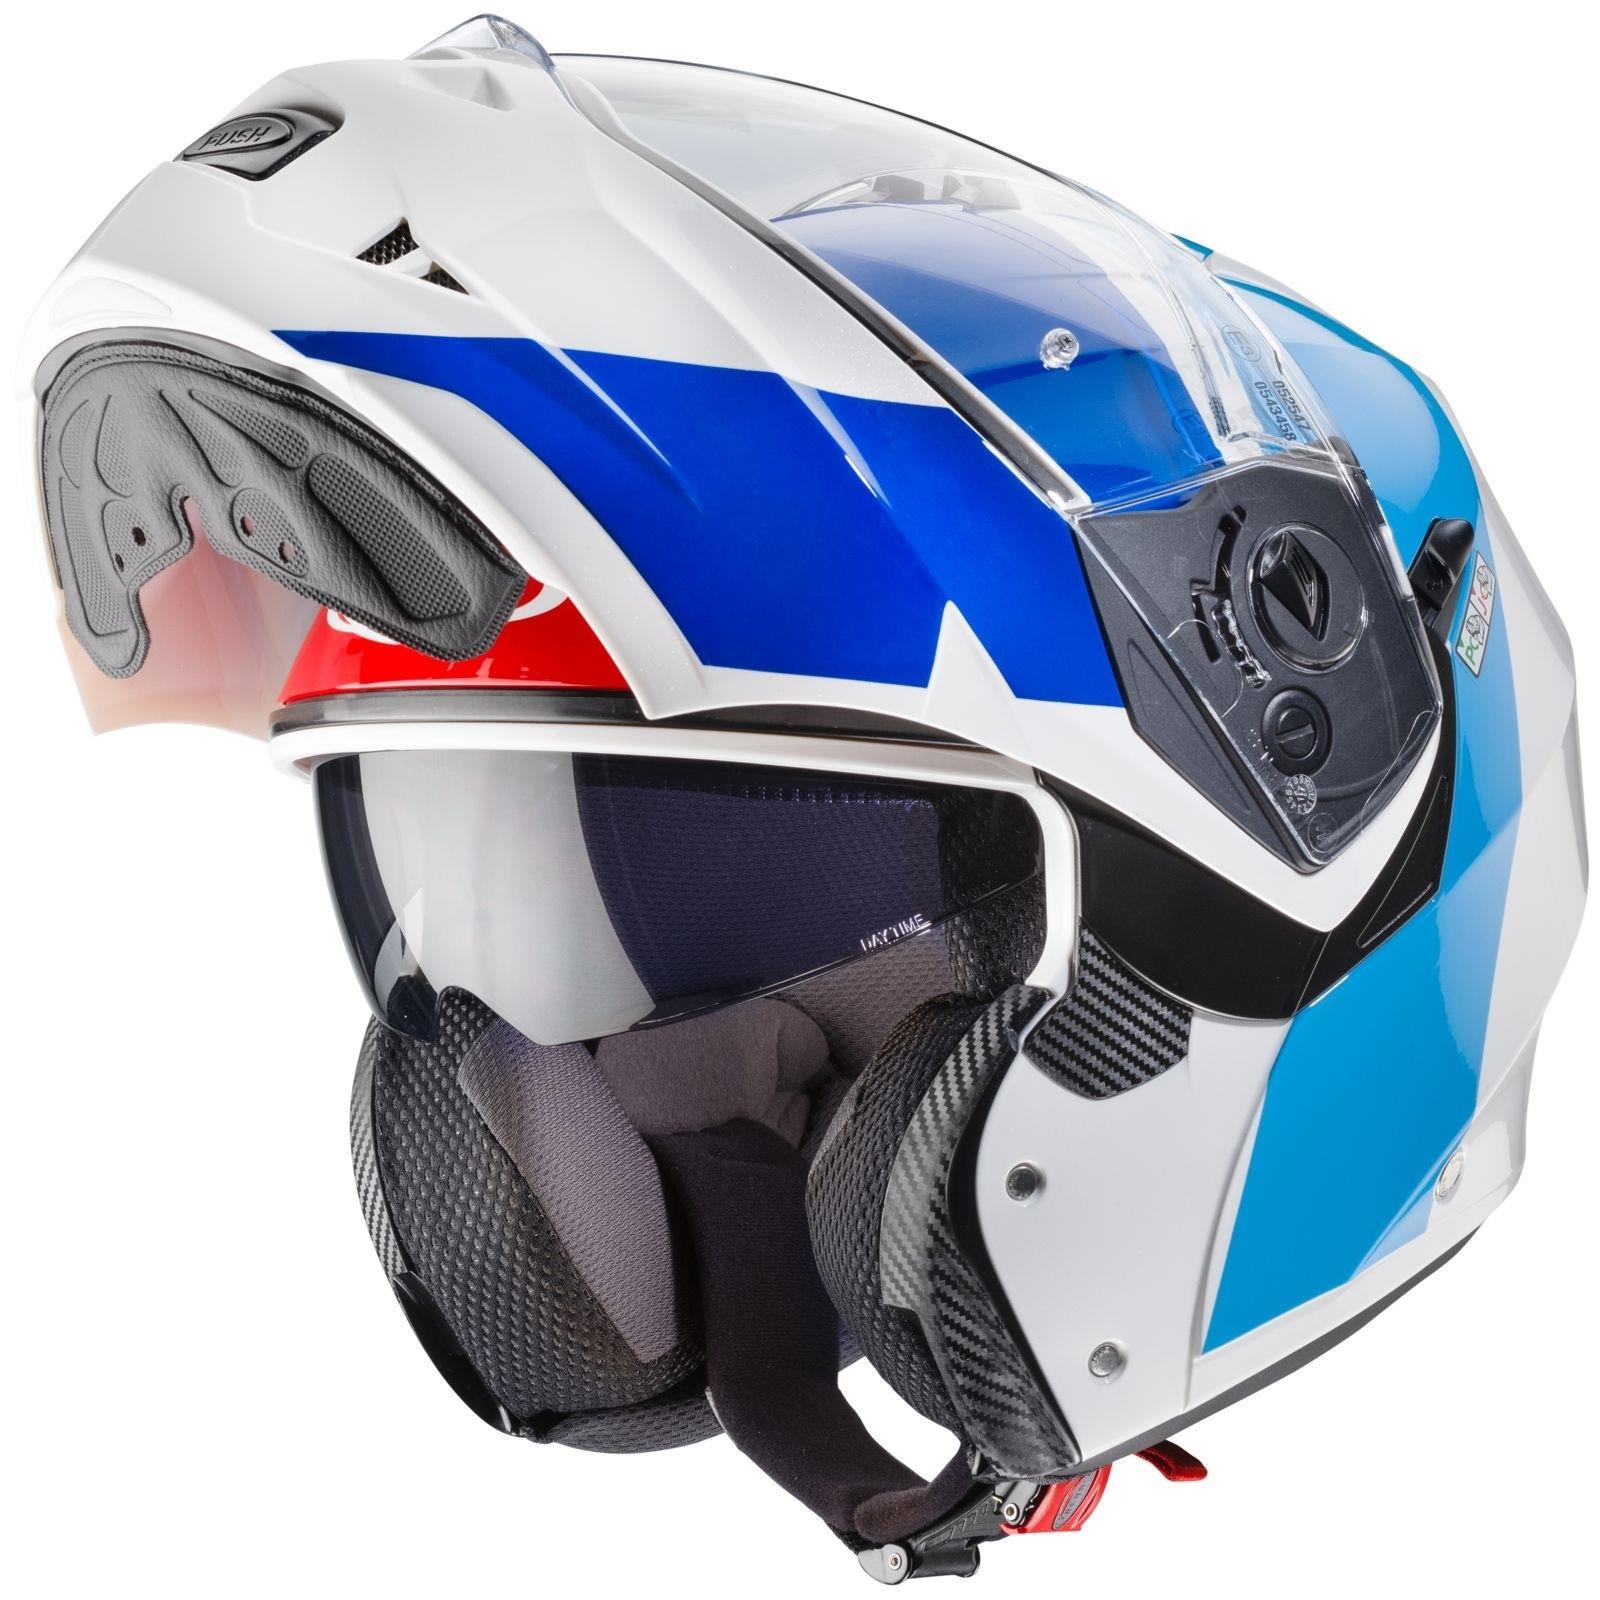 Caberg-Klapp-Helm-Duke-II-2-Motorrad-Belueftet-Sonnenblende-Pinlock-Visier-Jet Indexbild 28